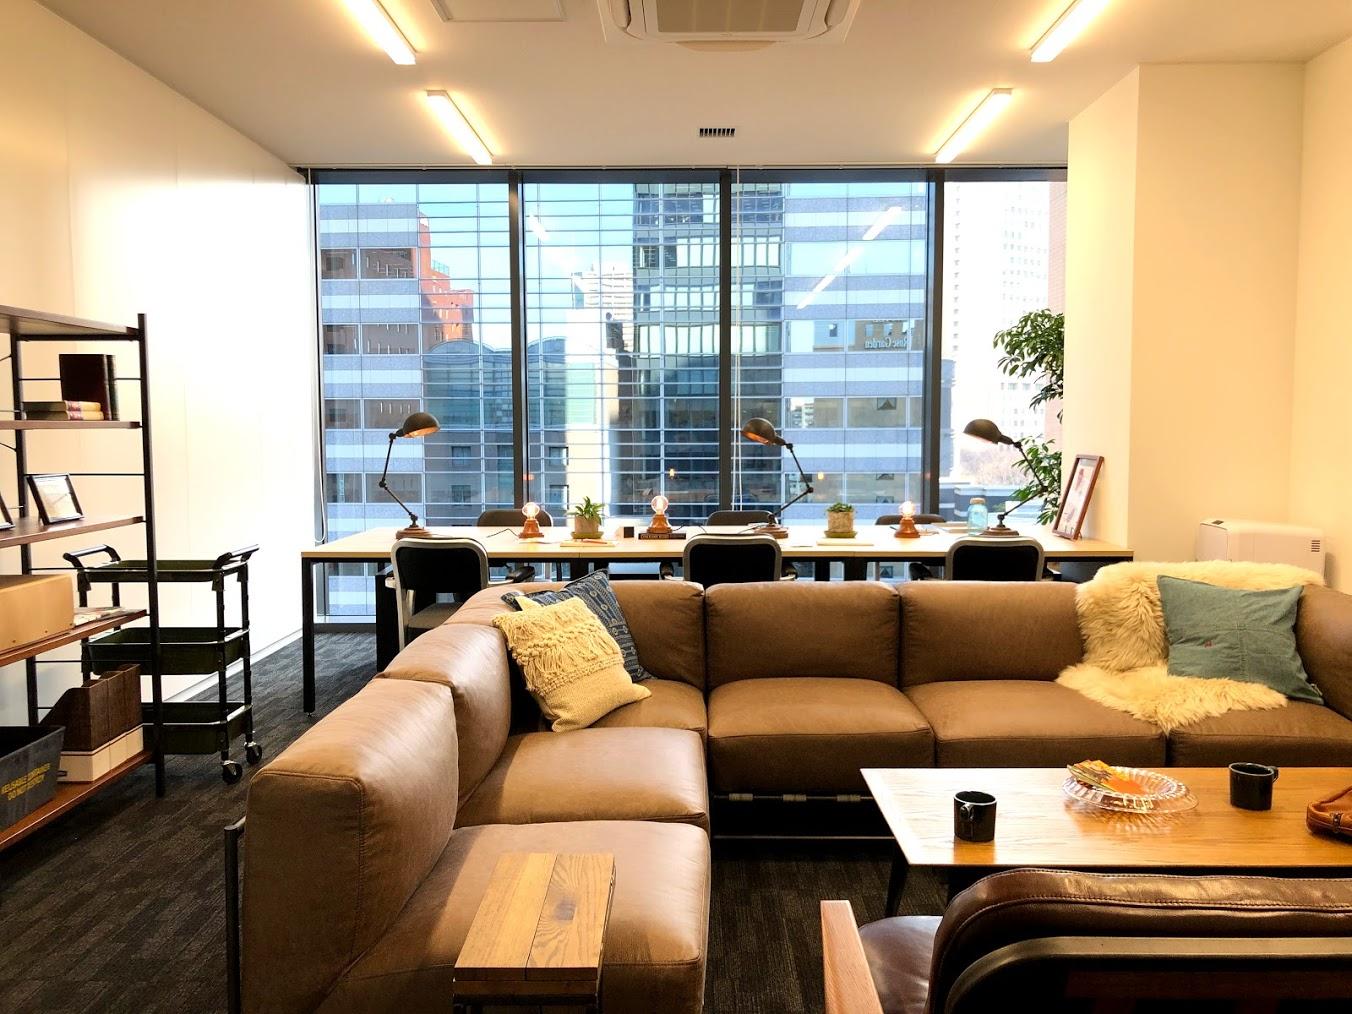 H1O西新宿_エイチワンオー西新宿_個室サービスオフィスイメージ